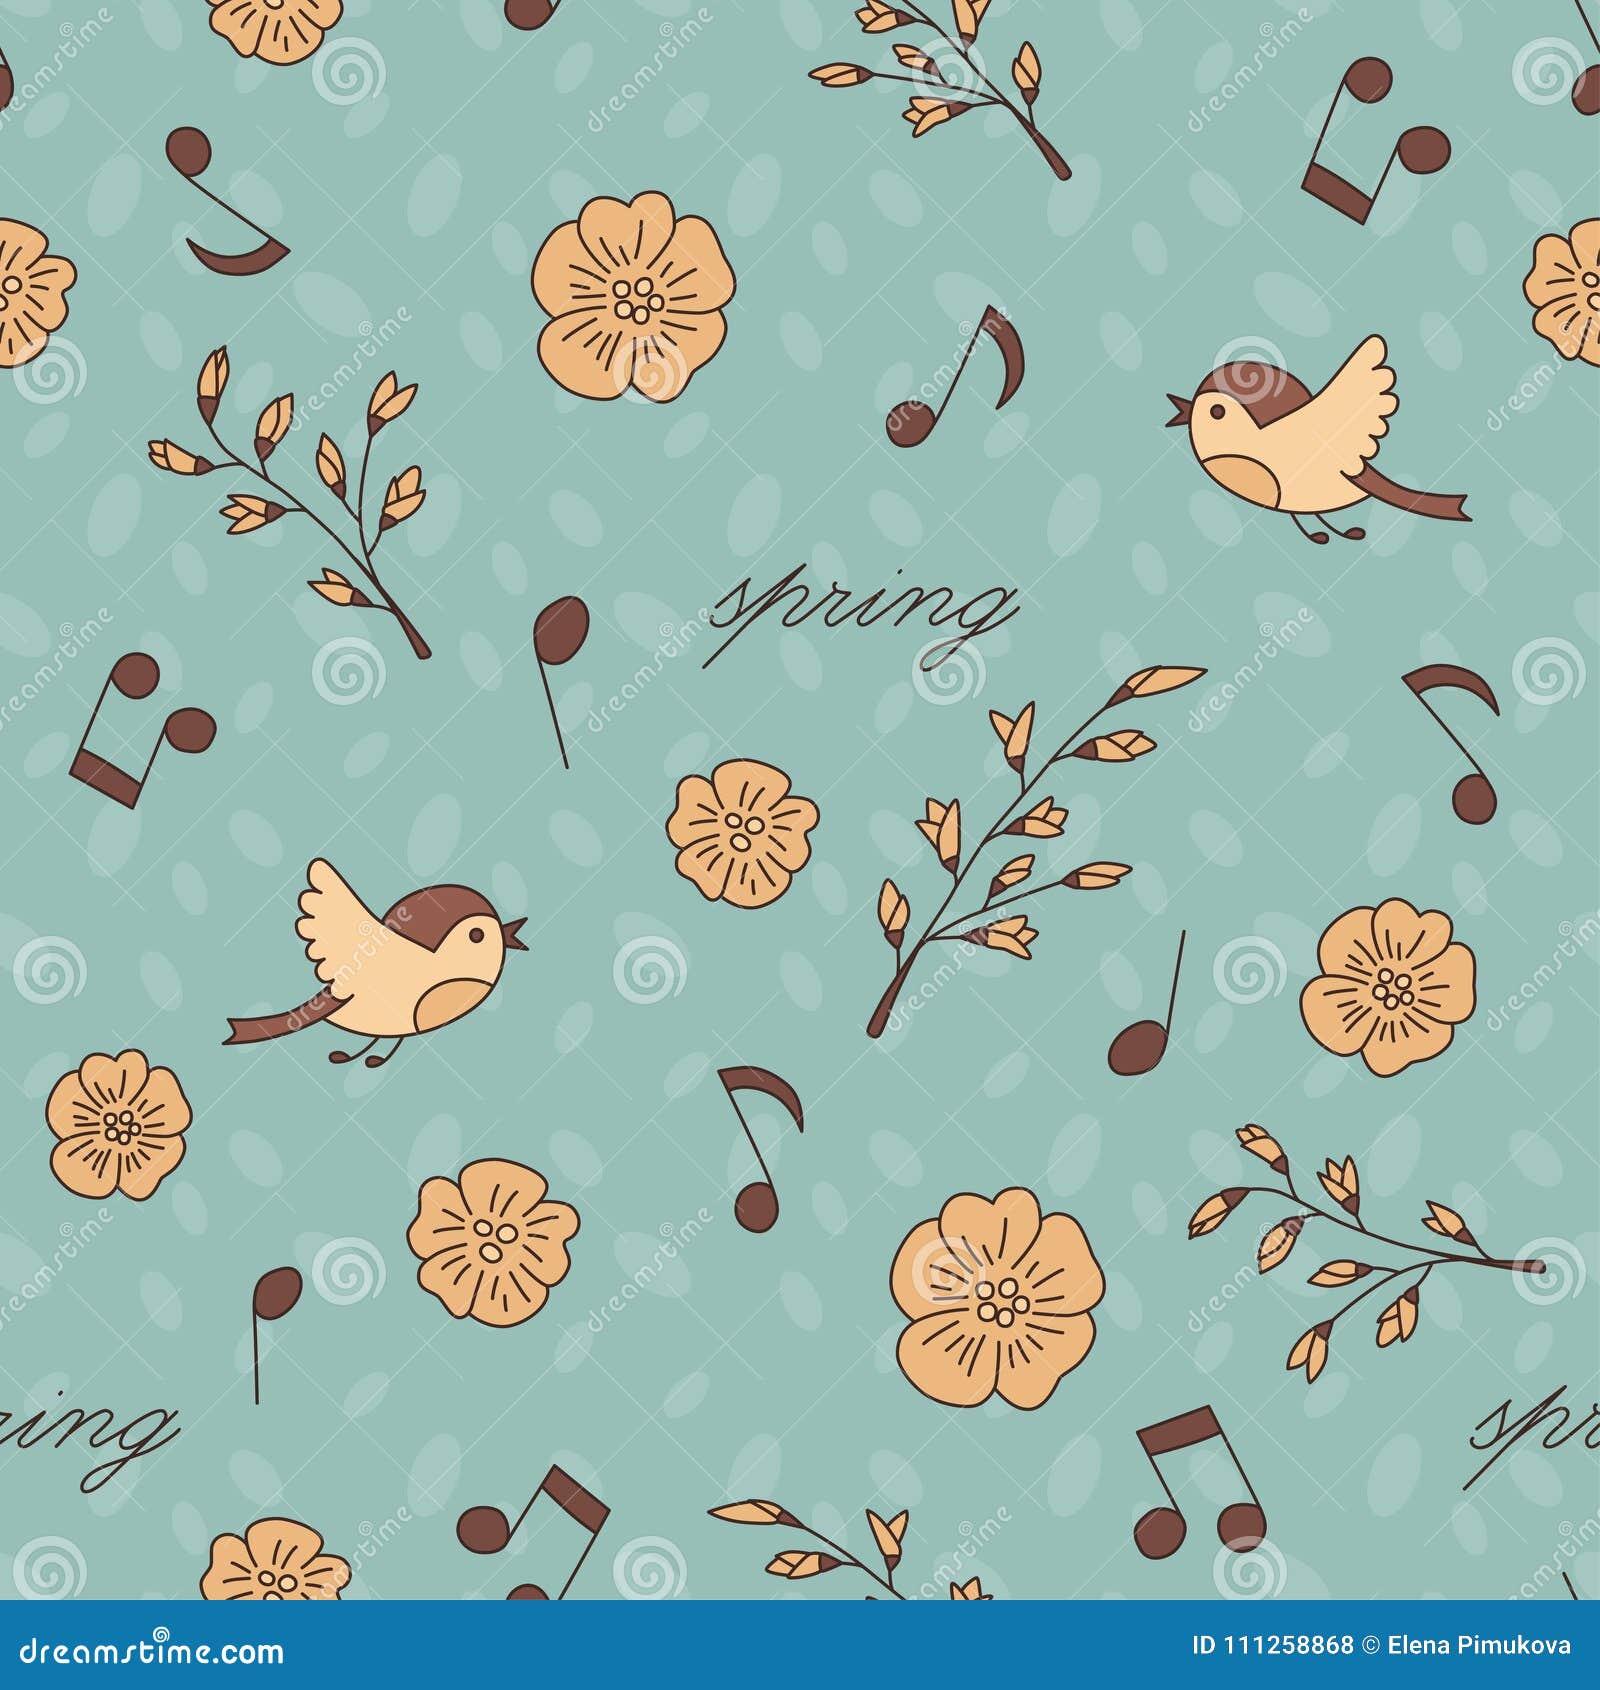 Best Wallpaper Music Spring - spring-birds-music-doodle-cartoon-seamless-pattern-spring-birds-music-doodle-cartoon-seamless-pattern-vector-eps-111258868  Trends_49421.jpg